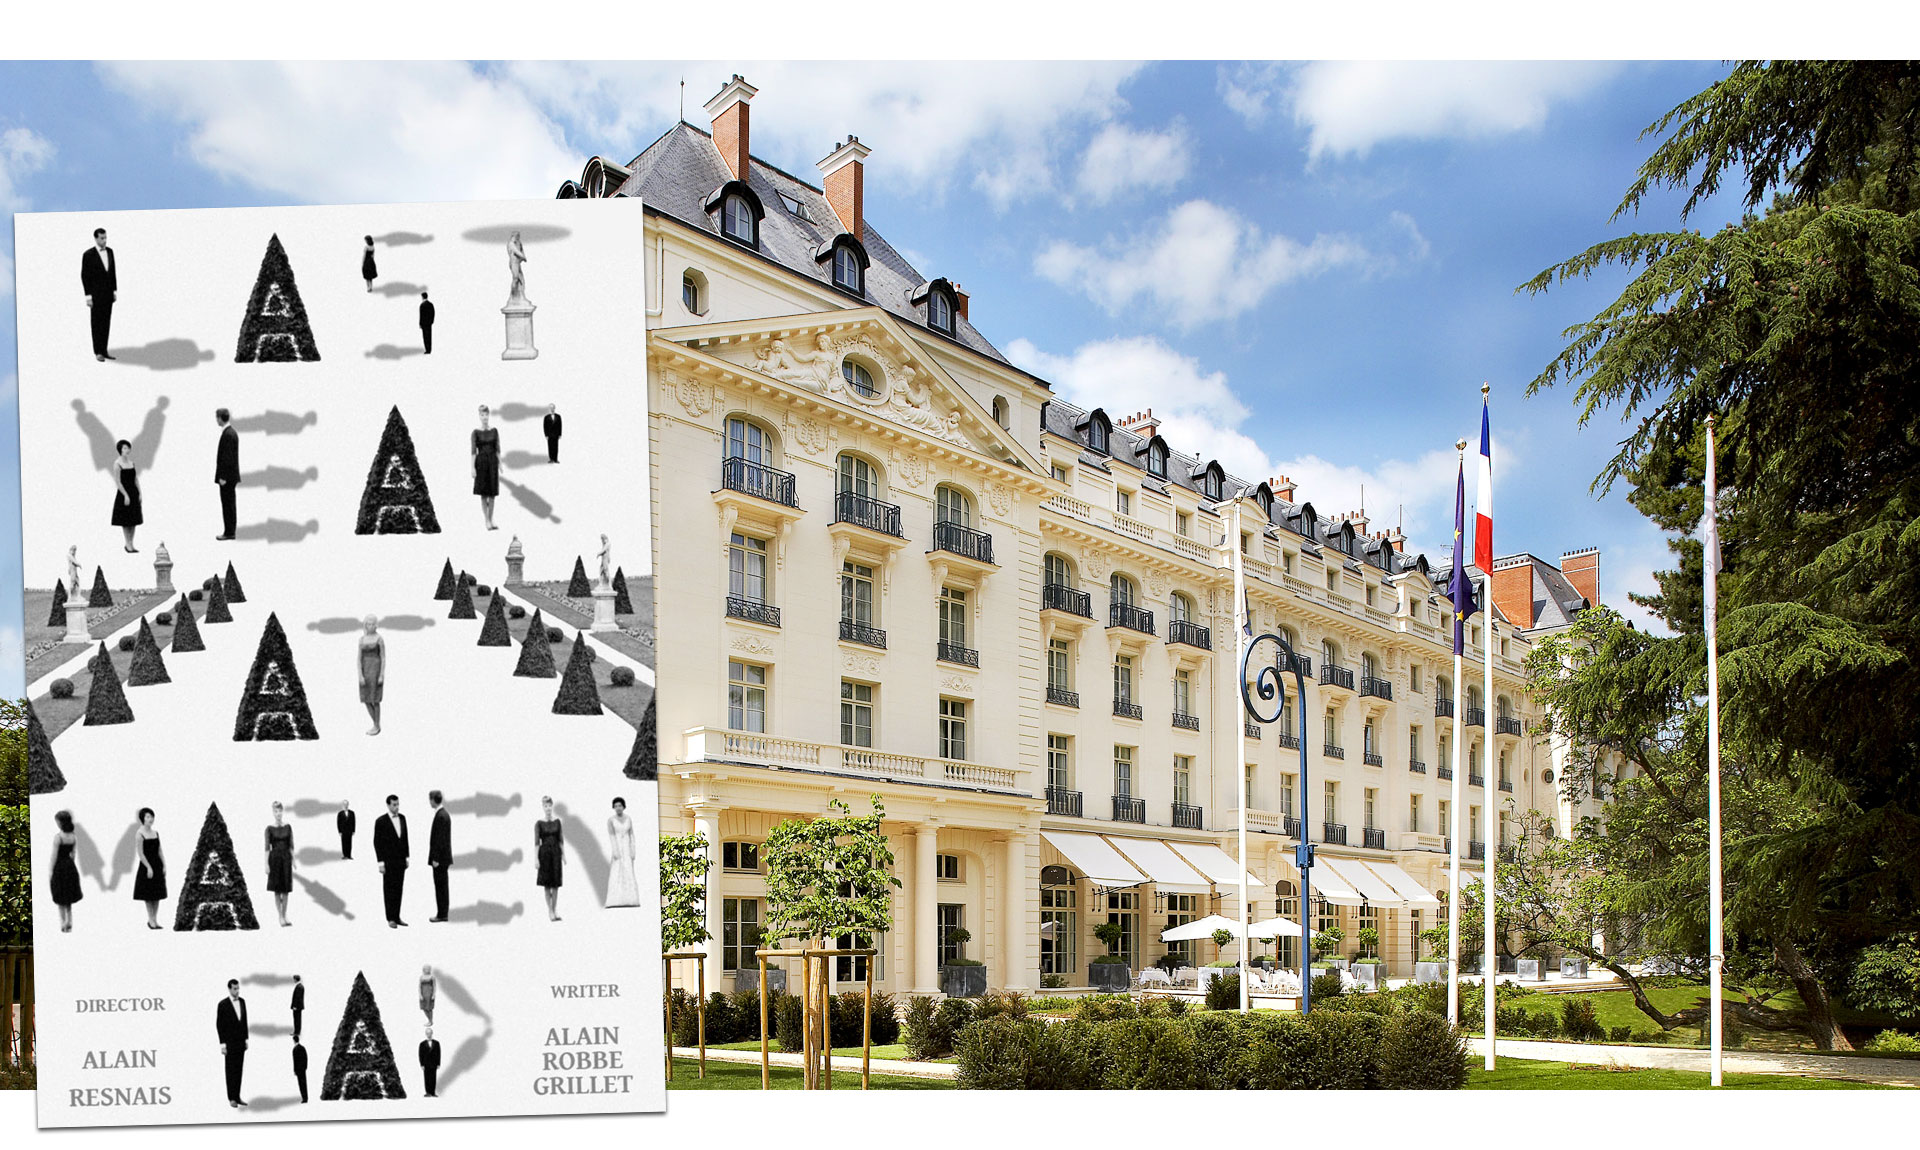 Trianon Palace Versailles - 5 star luxury hotel in Versailles